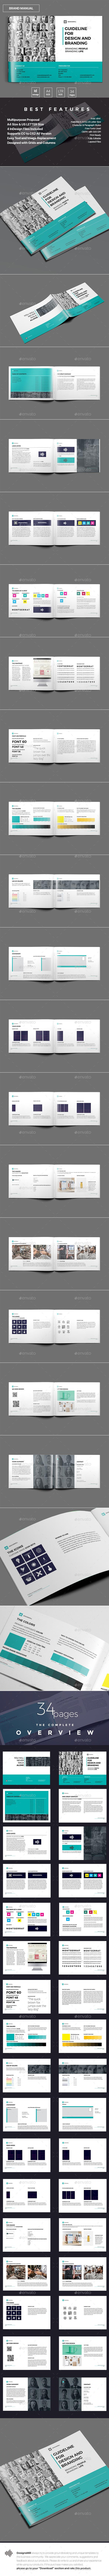 Brand Manual Brochure - Brochures Print Templates